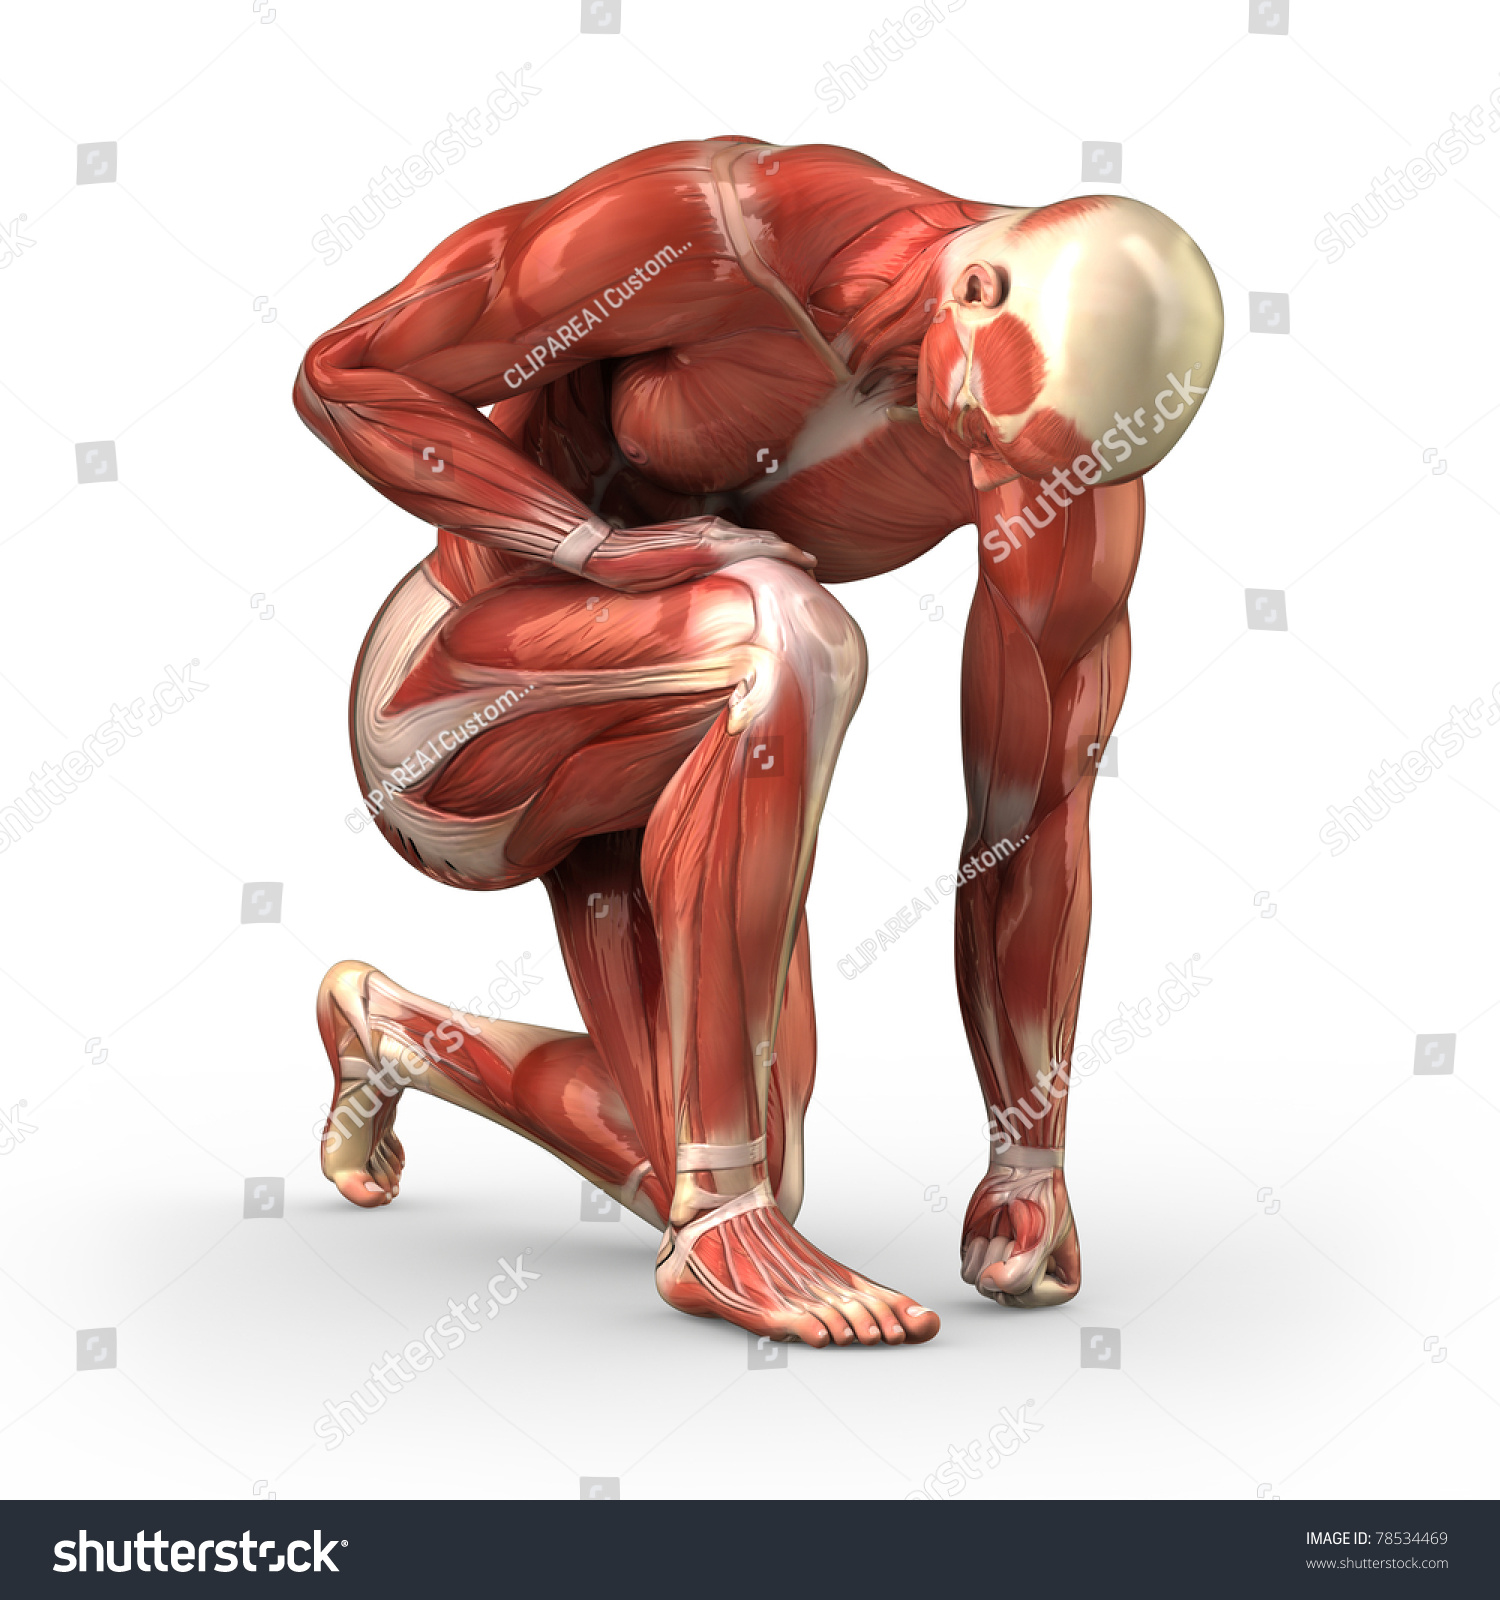 Man Without Skin Kneeling On Ground Stock Illustration 78534469